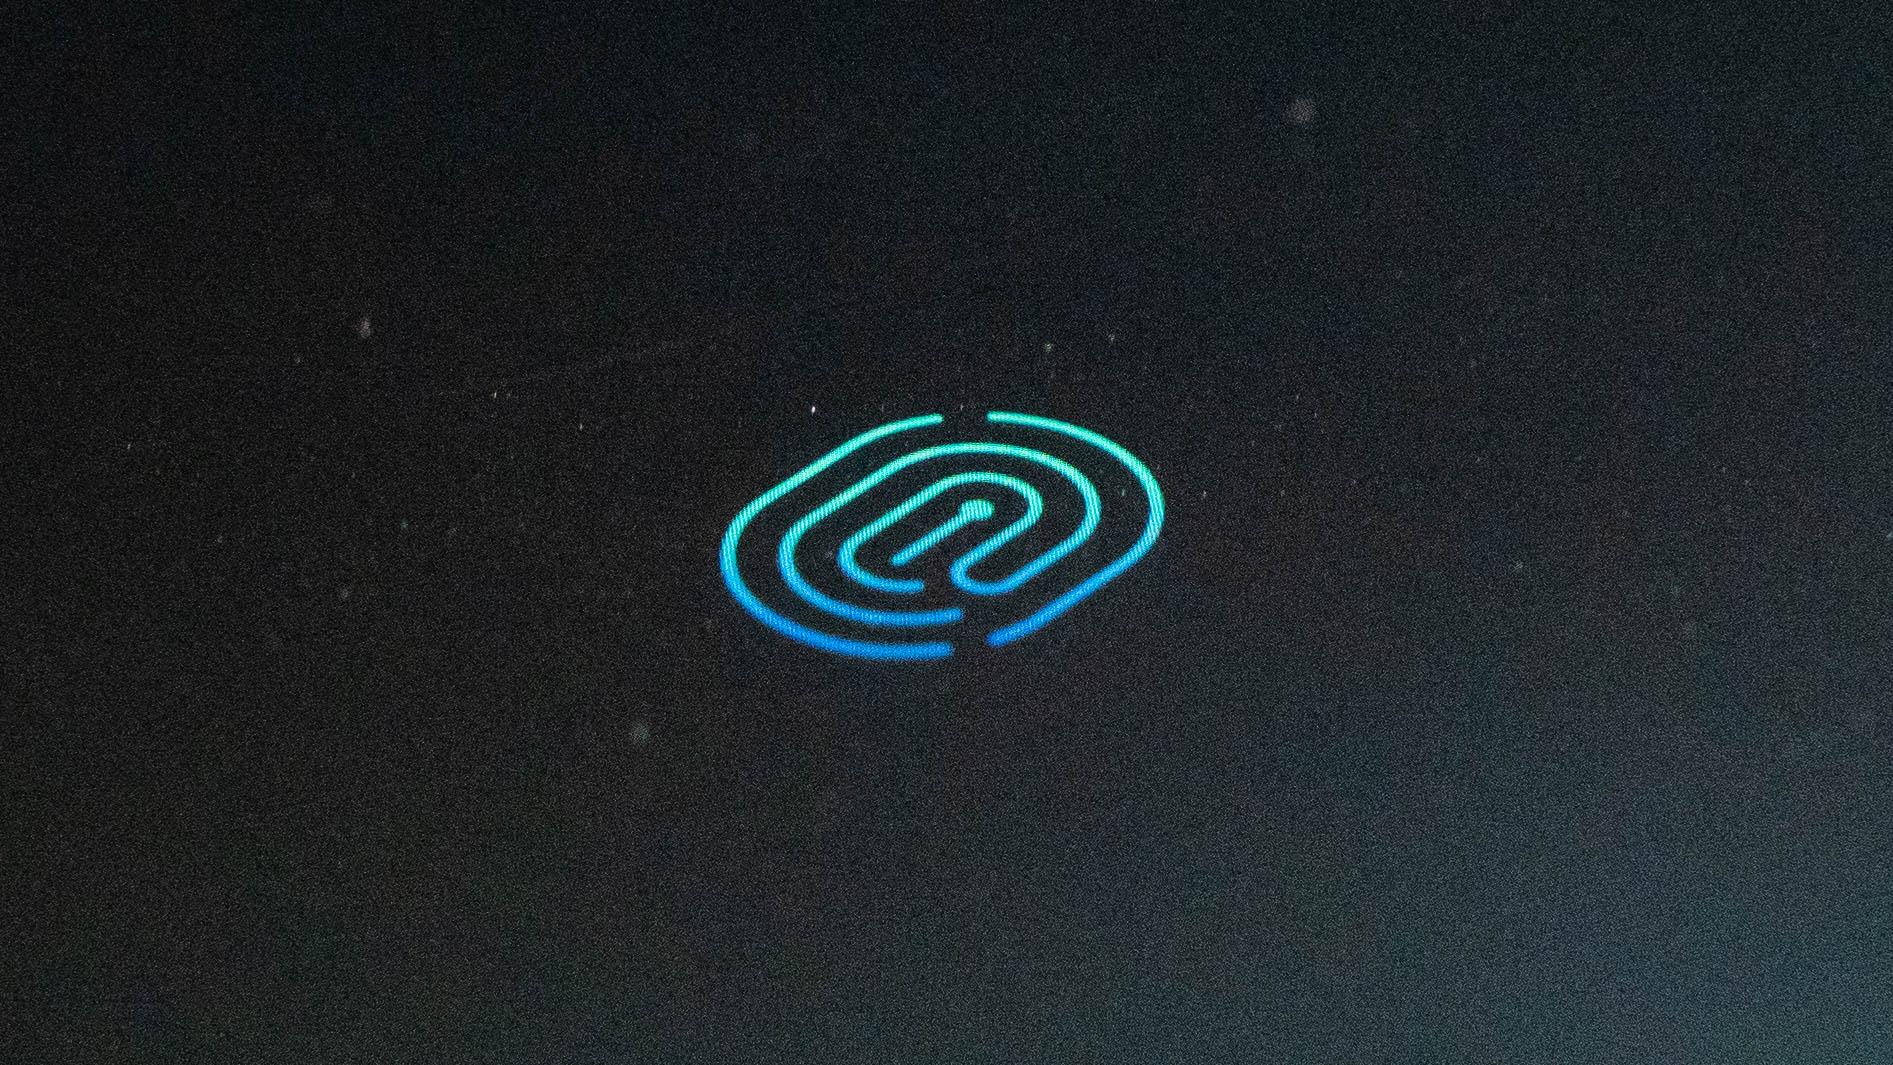 Asus ROG Phone 5 product shot of the in display fingerprint scanner